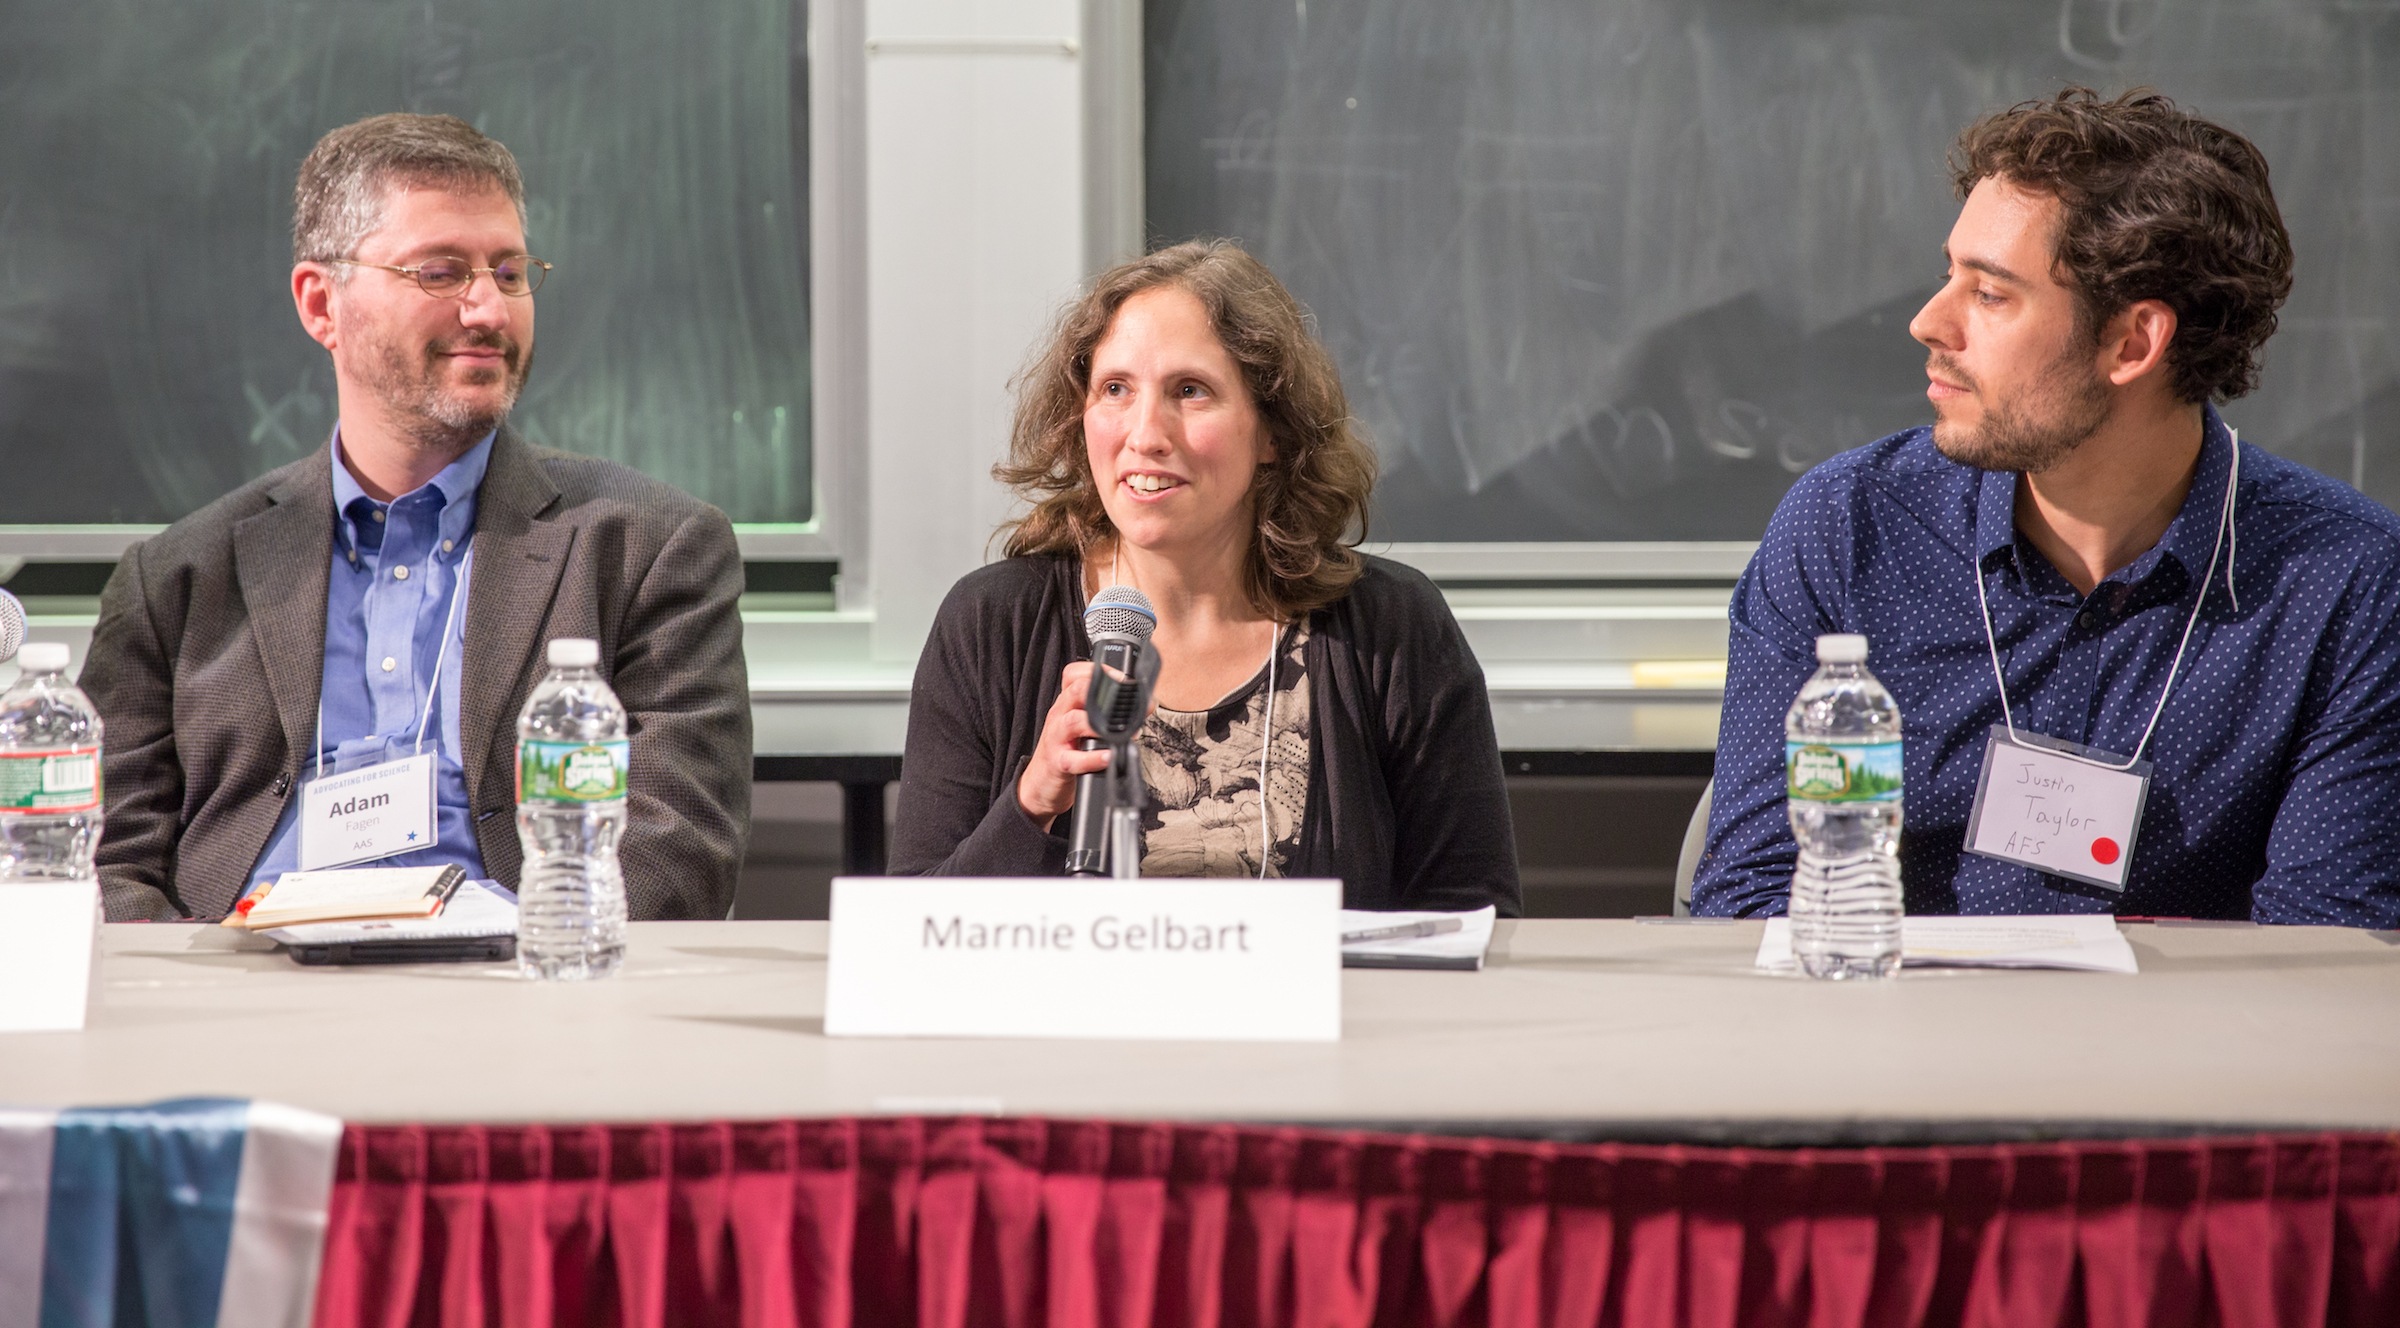 Future of Science panel (Cambridge, MA)